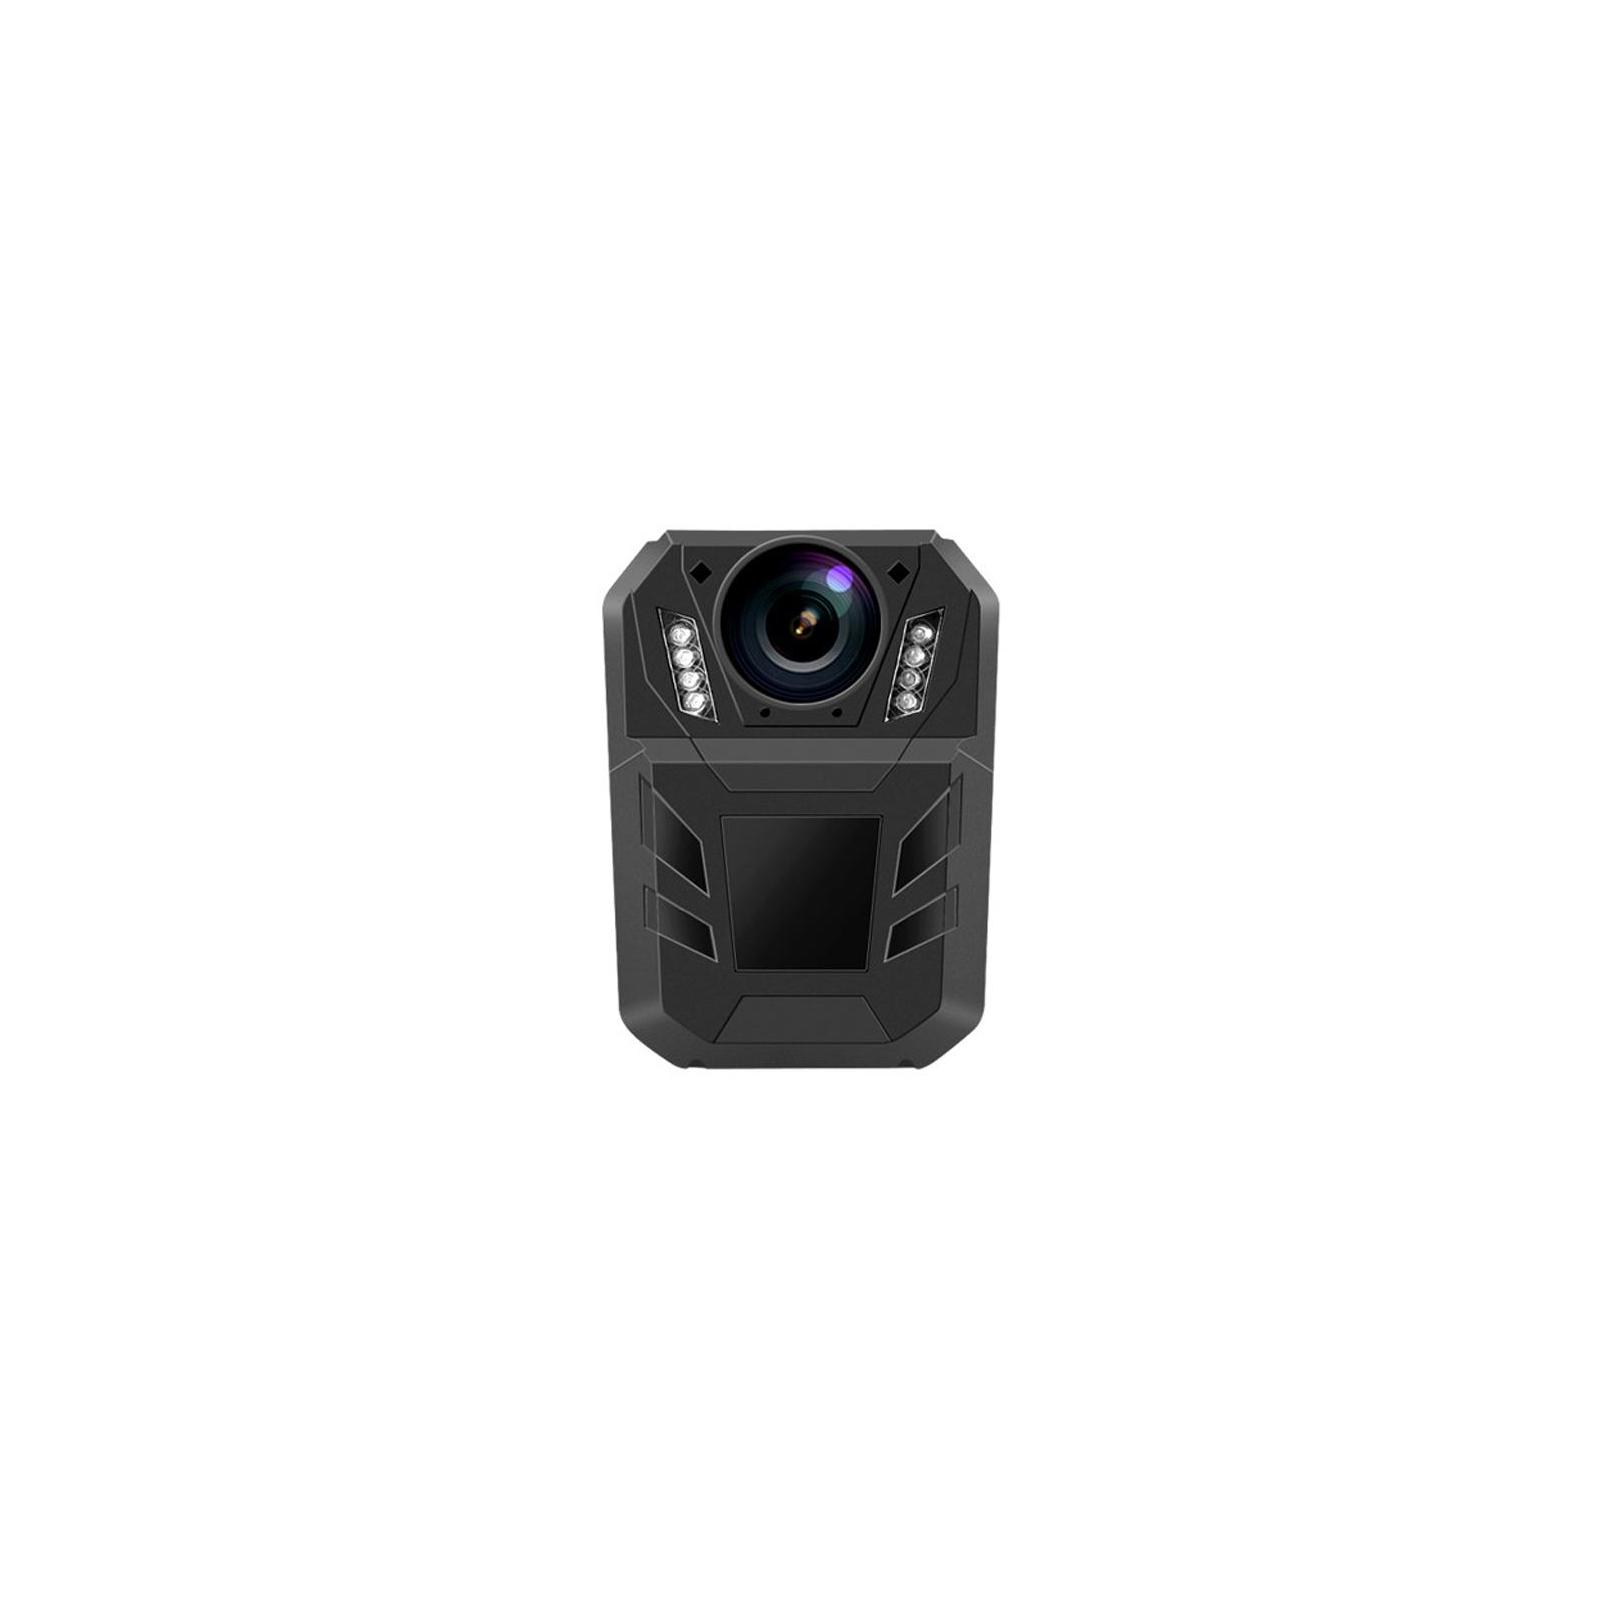 Видеорегистратор Globex Body Camera GE-915 (GE-915)